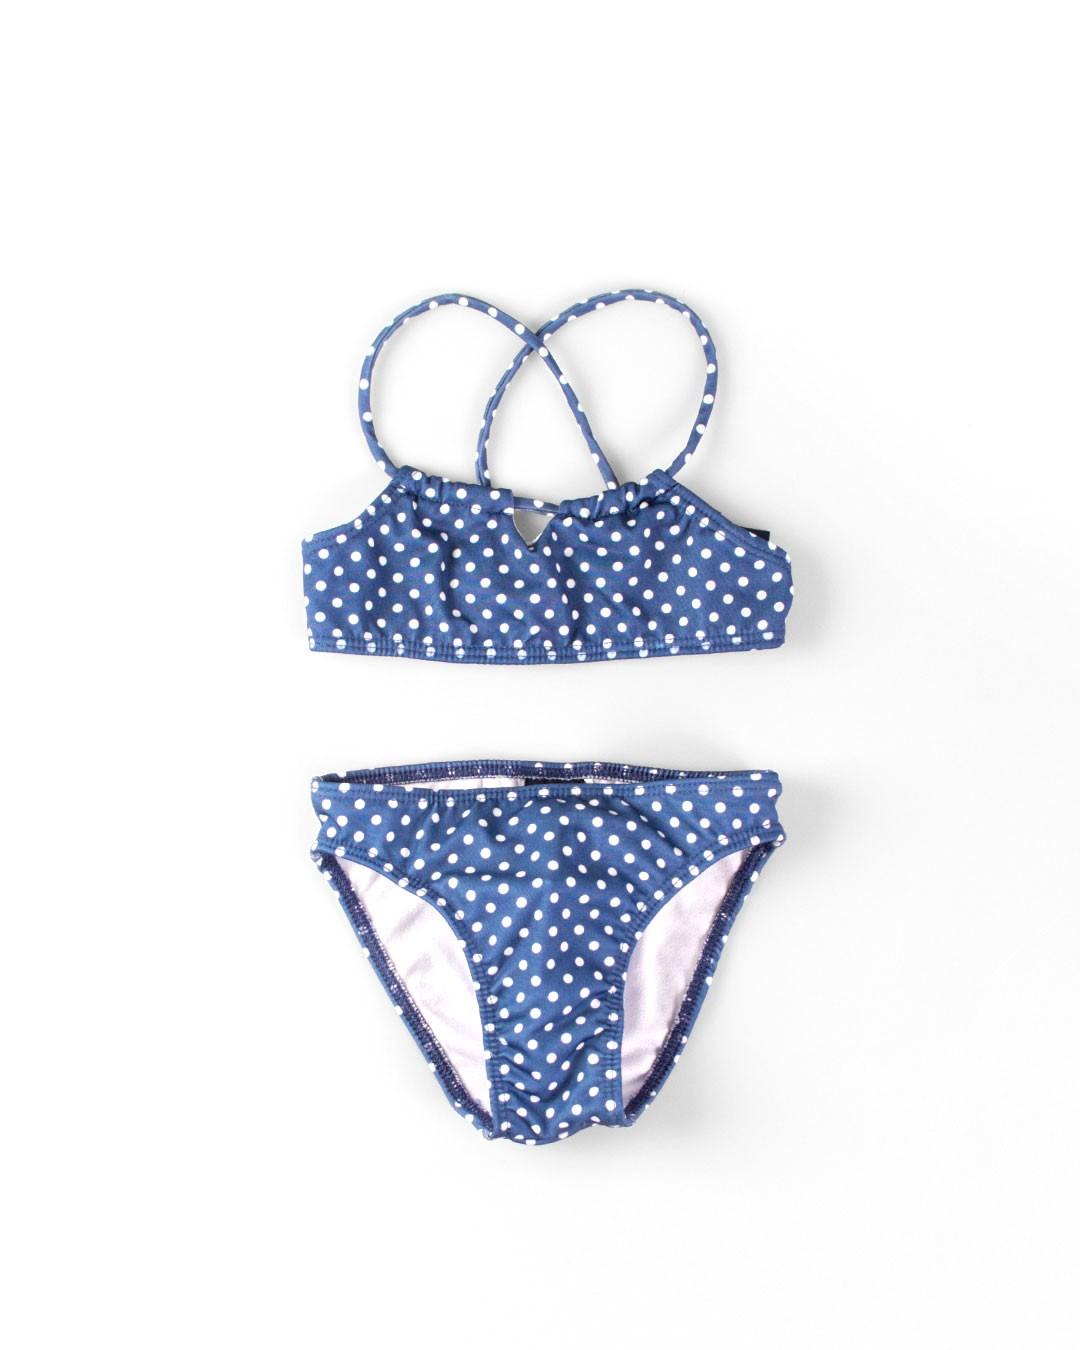 Biquini Infantil Bolinhas Azul - VNT